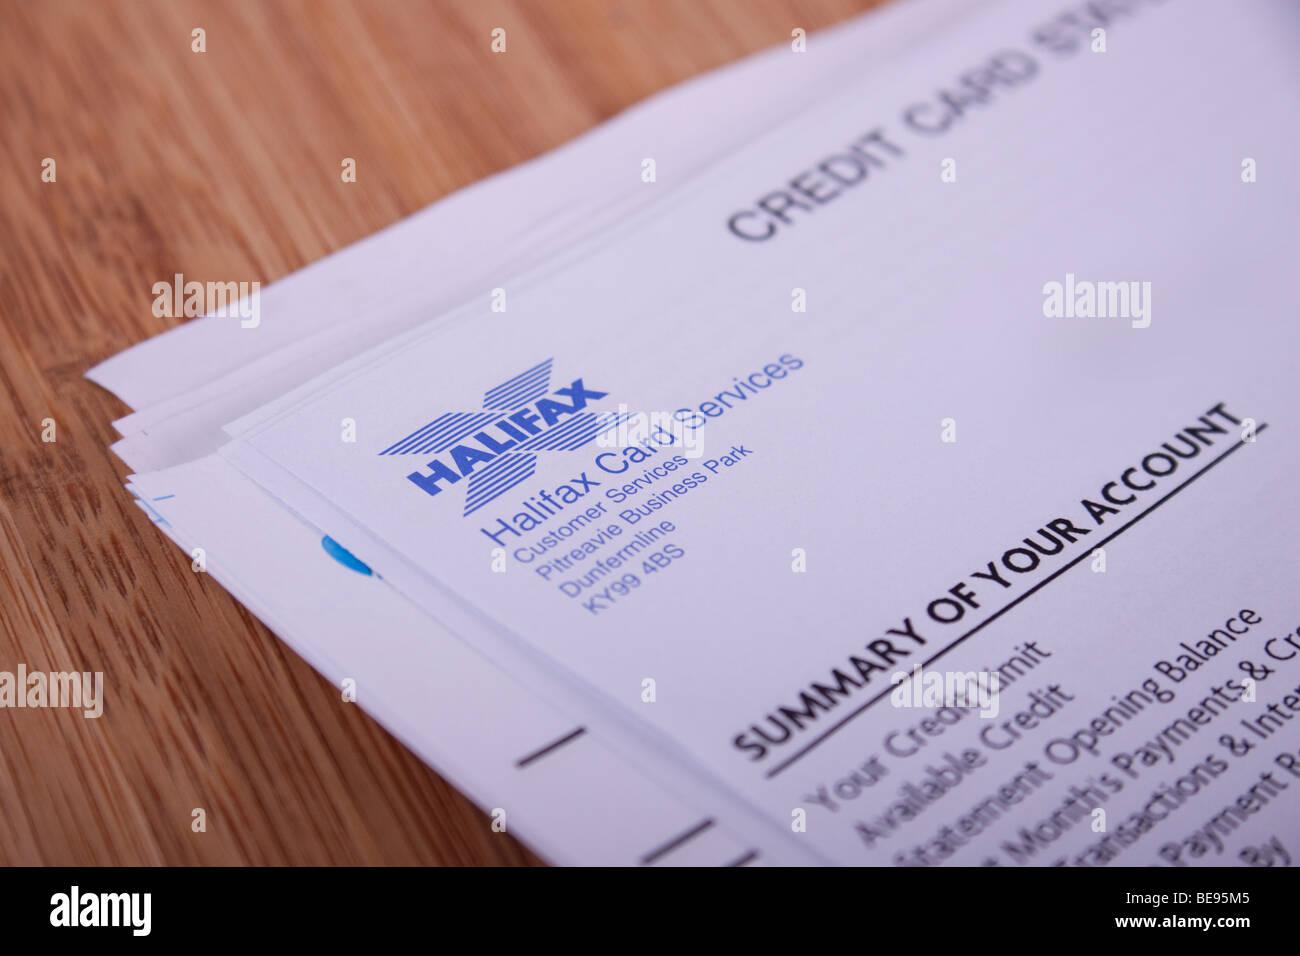 Halifax Credit Card Statement Stock Photo Alamy